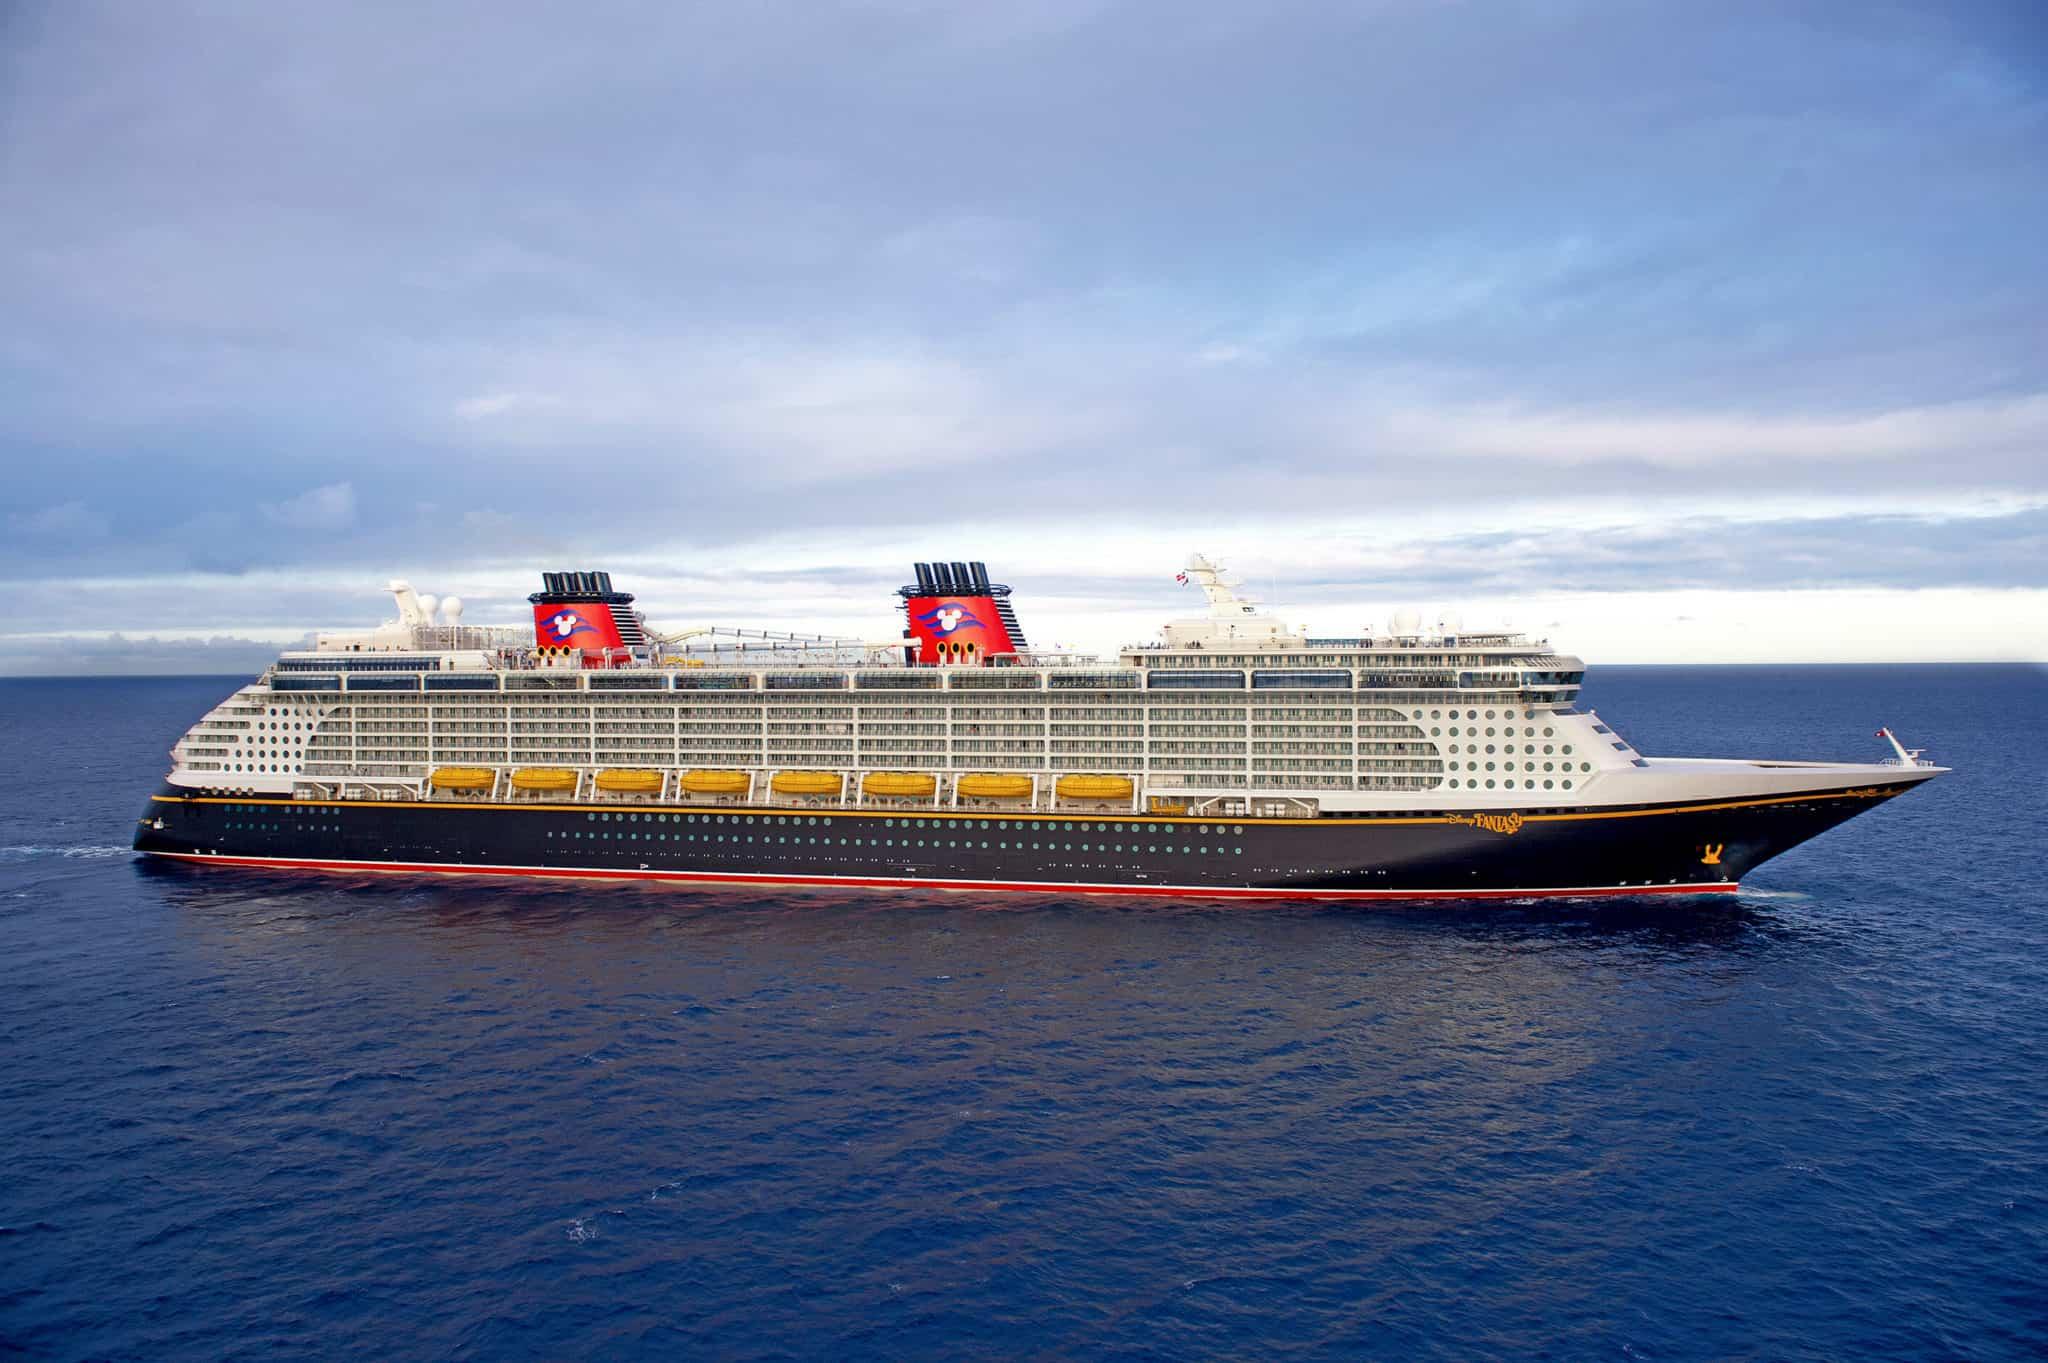 Disney cruise line fantasy aerial